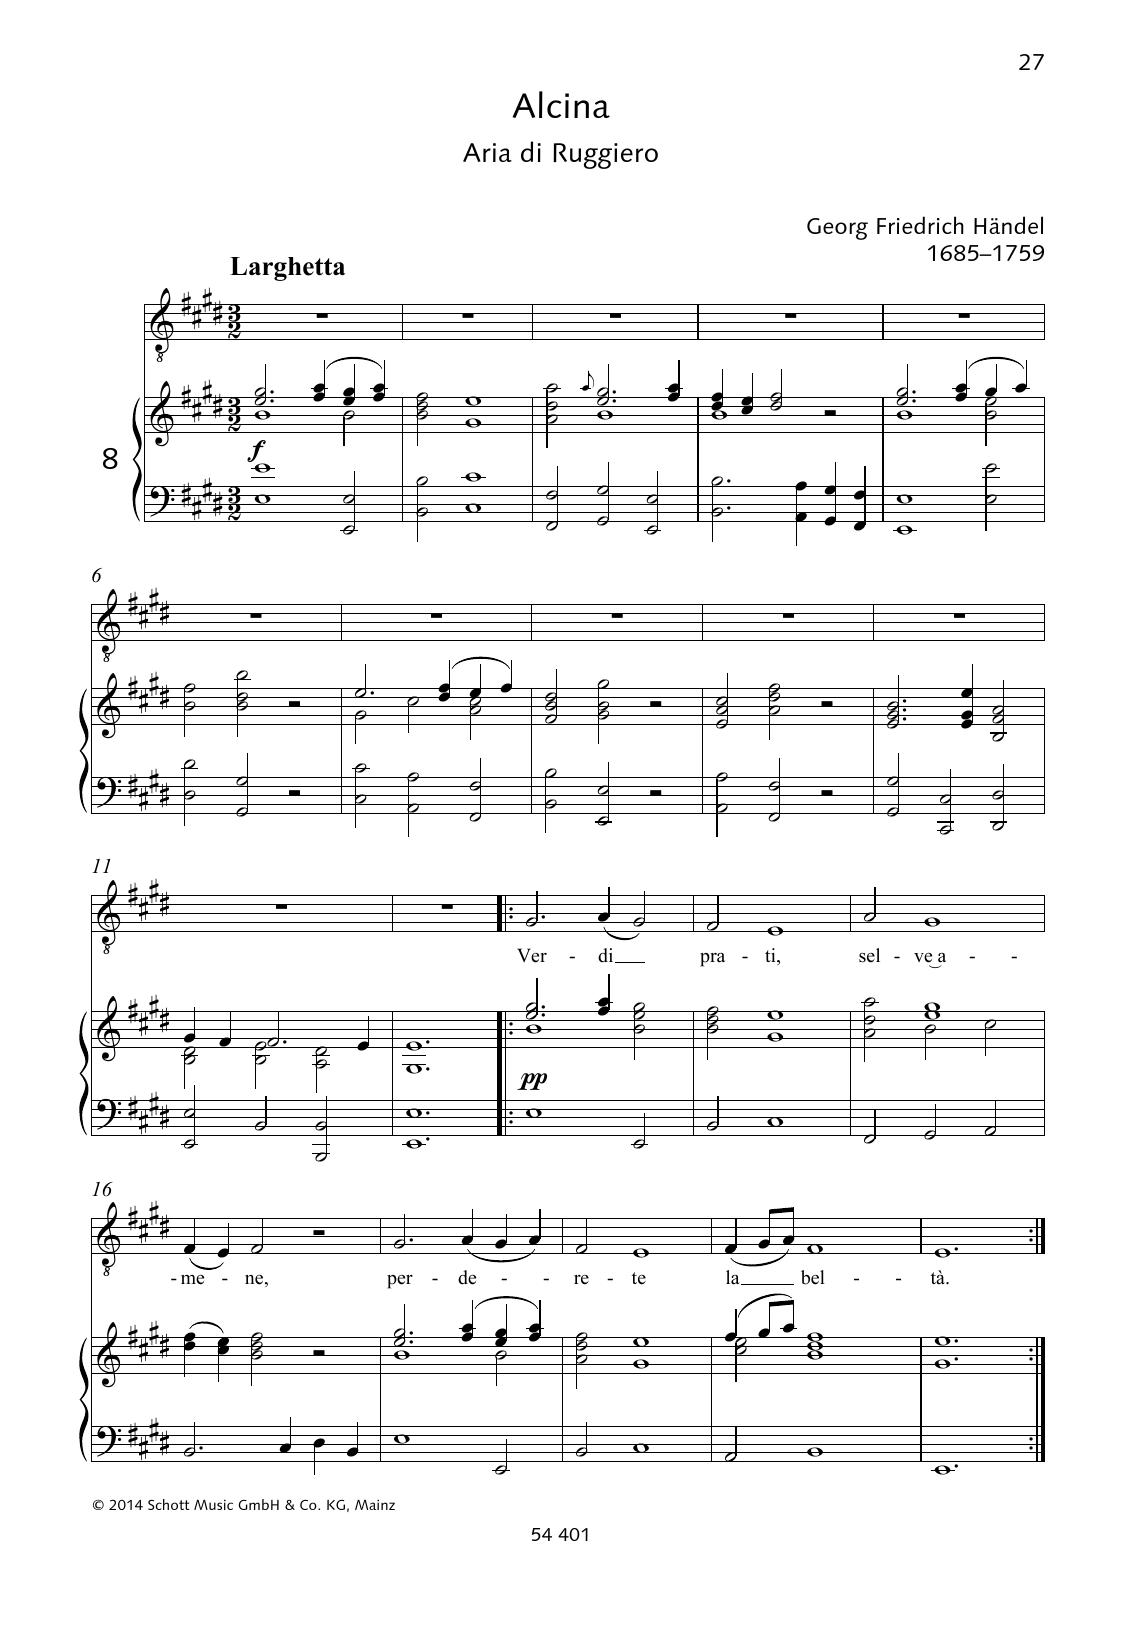 Verdi prati, selve amene Sheet Music